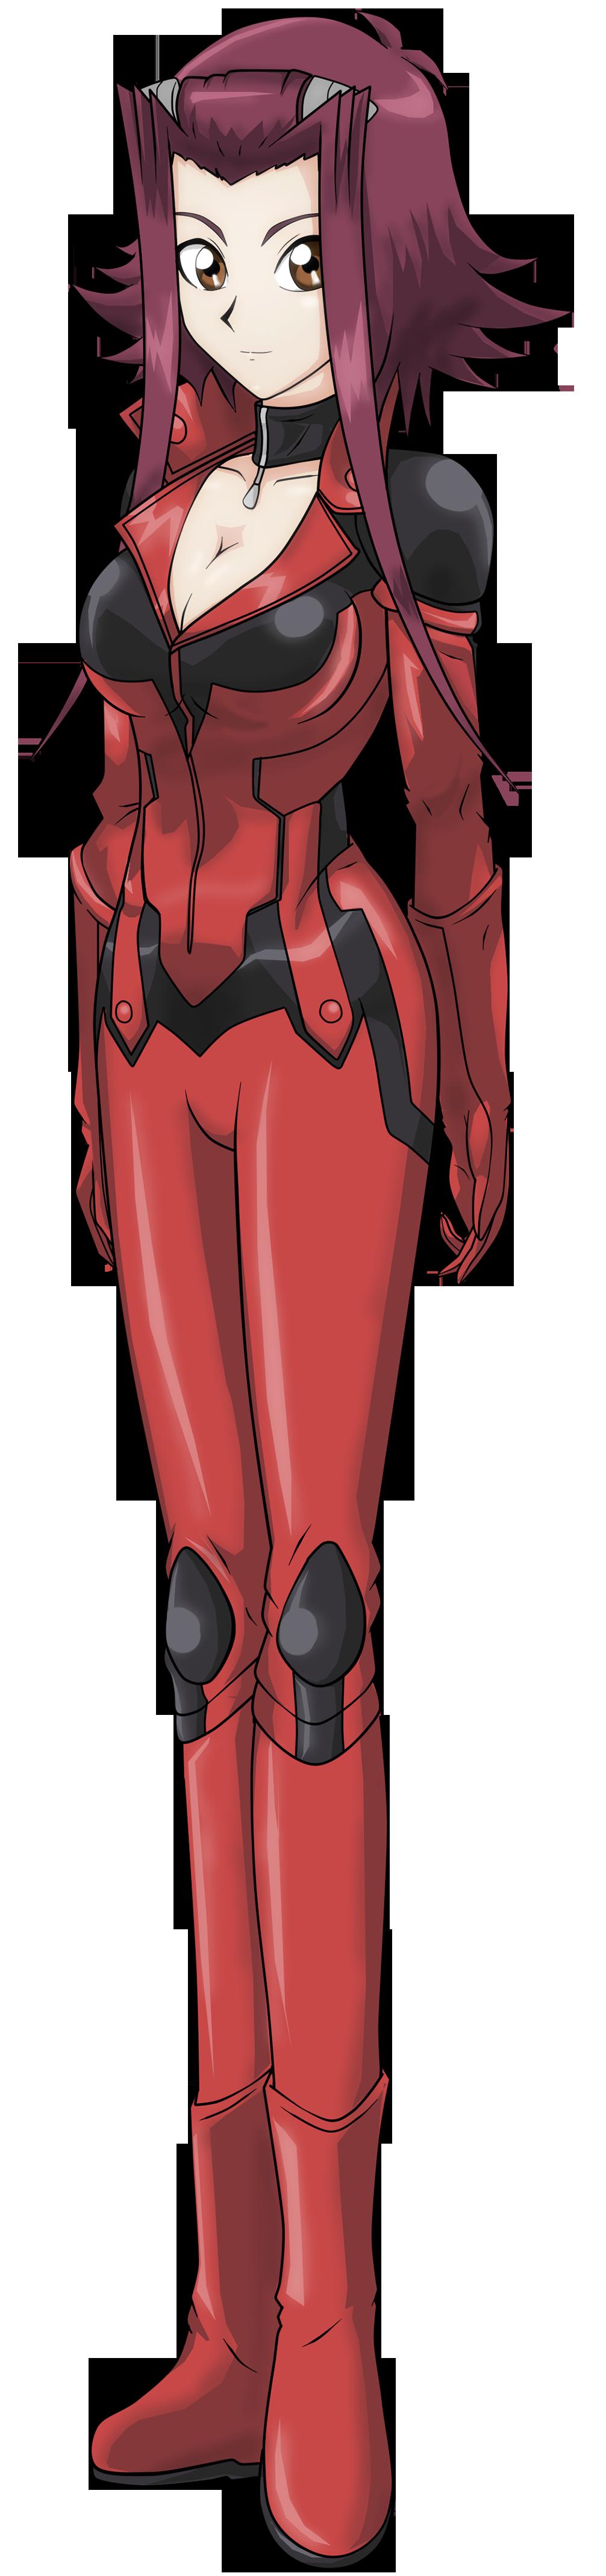 Aki izayoi-Asuka tenjouin | Shadow wolf, Asuka, Anime